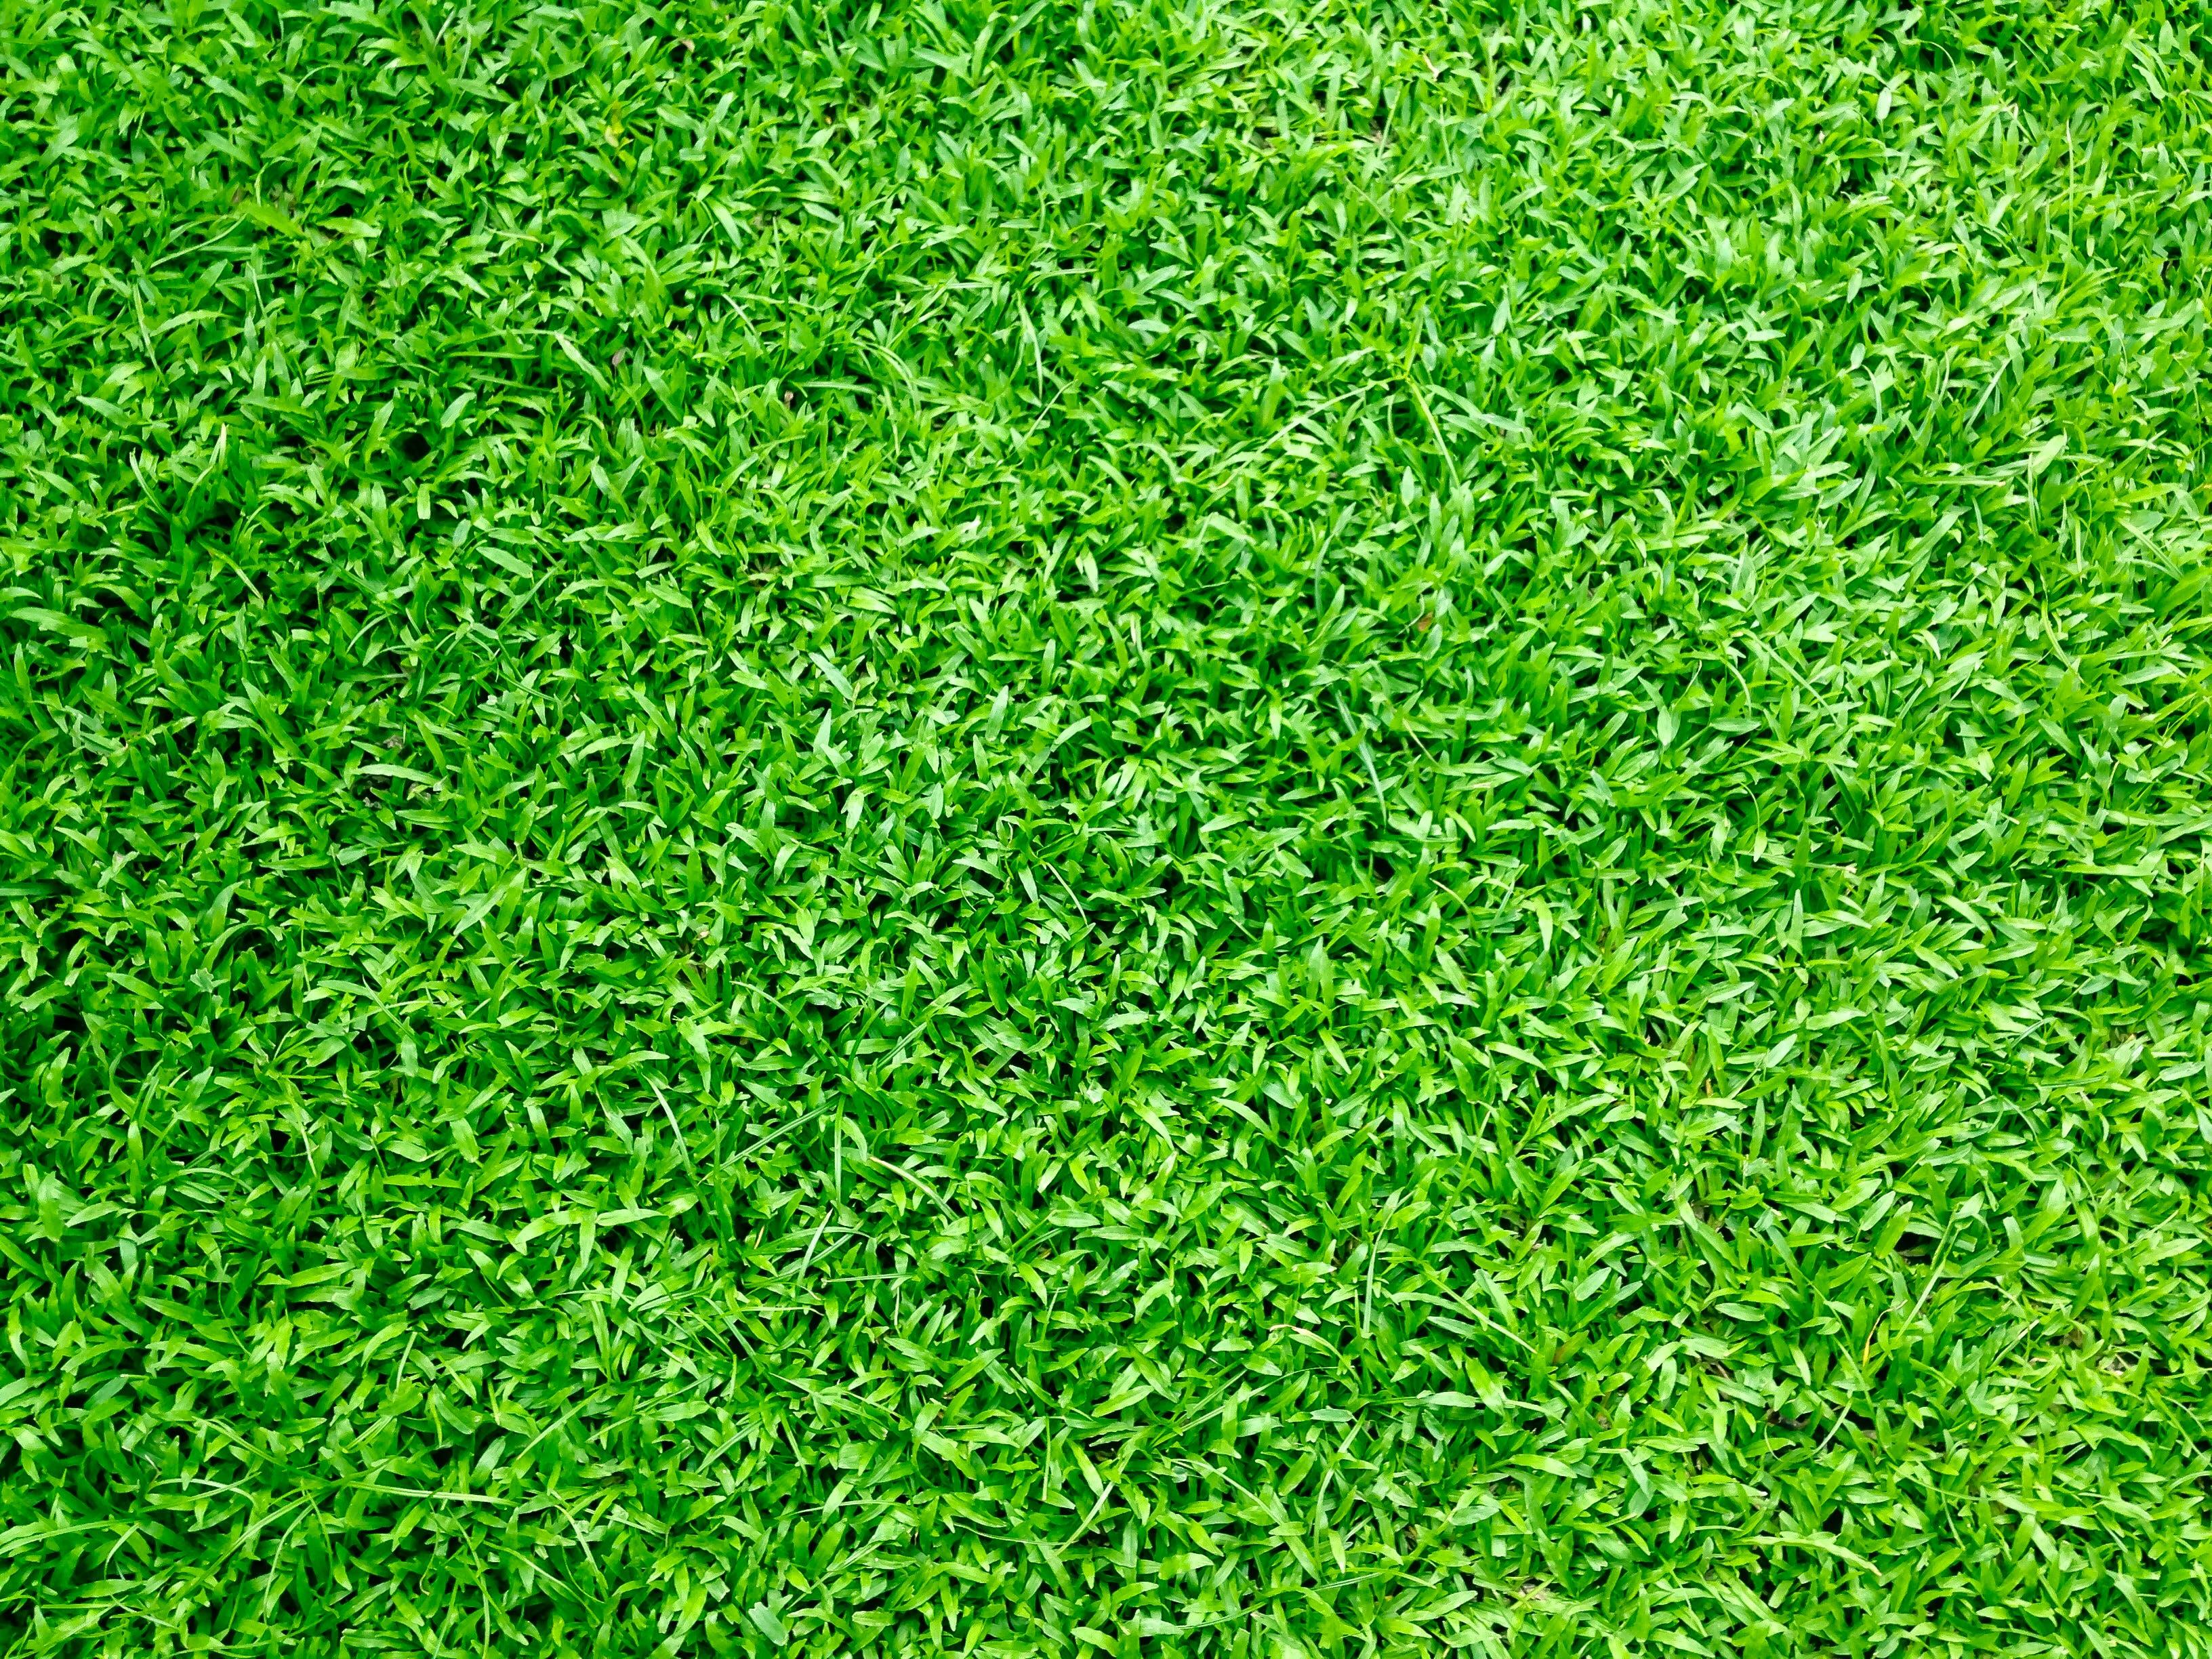 Безкоштовне стокове фото на тему «великий план, газон, двір, зелена трава»